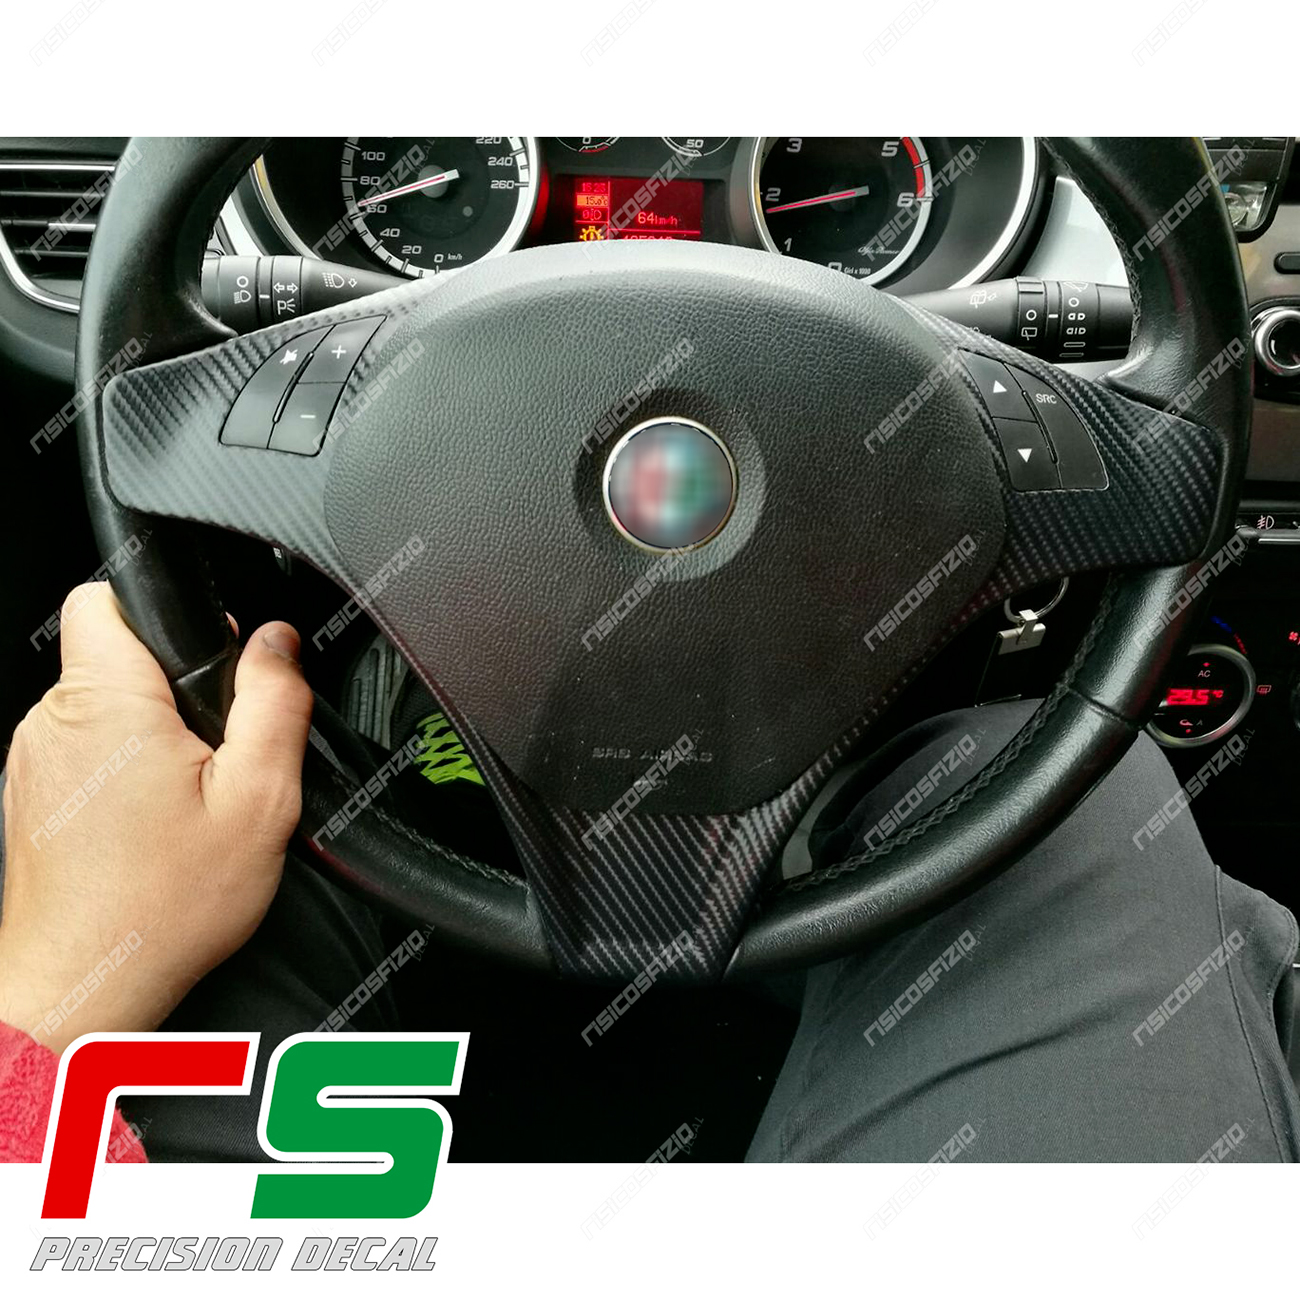 Stickers Car Alfa Romeo Mito Giulietta Commands Steering Wheel Decal Carbonlook